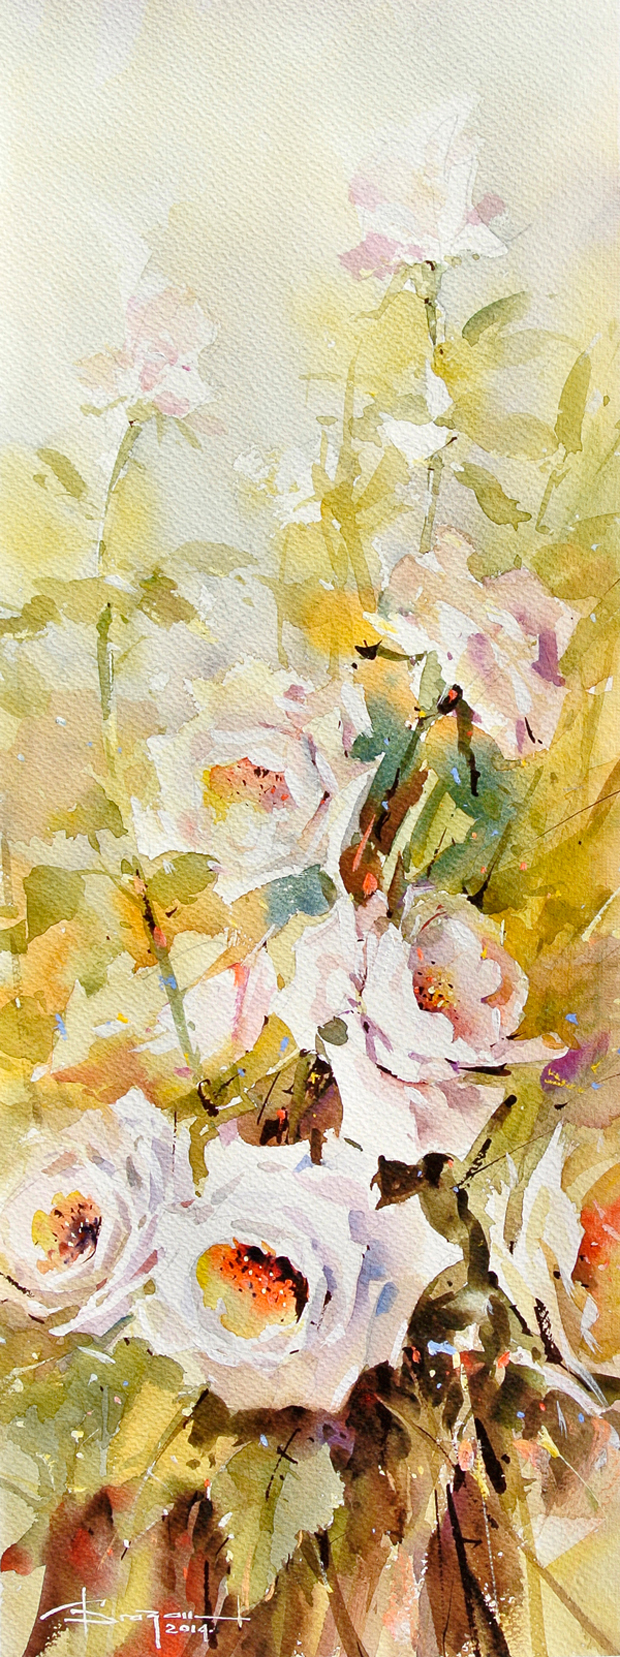 Watercolour-Acuarela-Corneliu-Dragan-Targoviste-floral-23